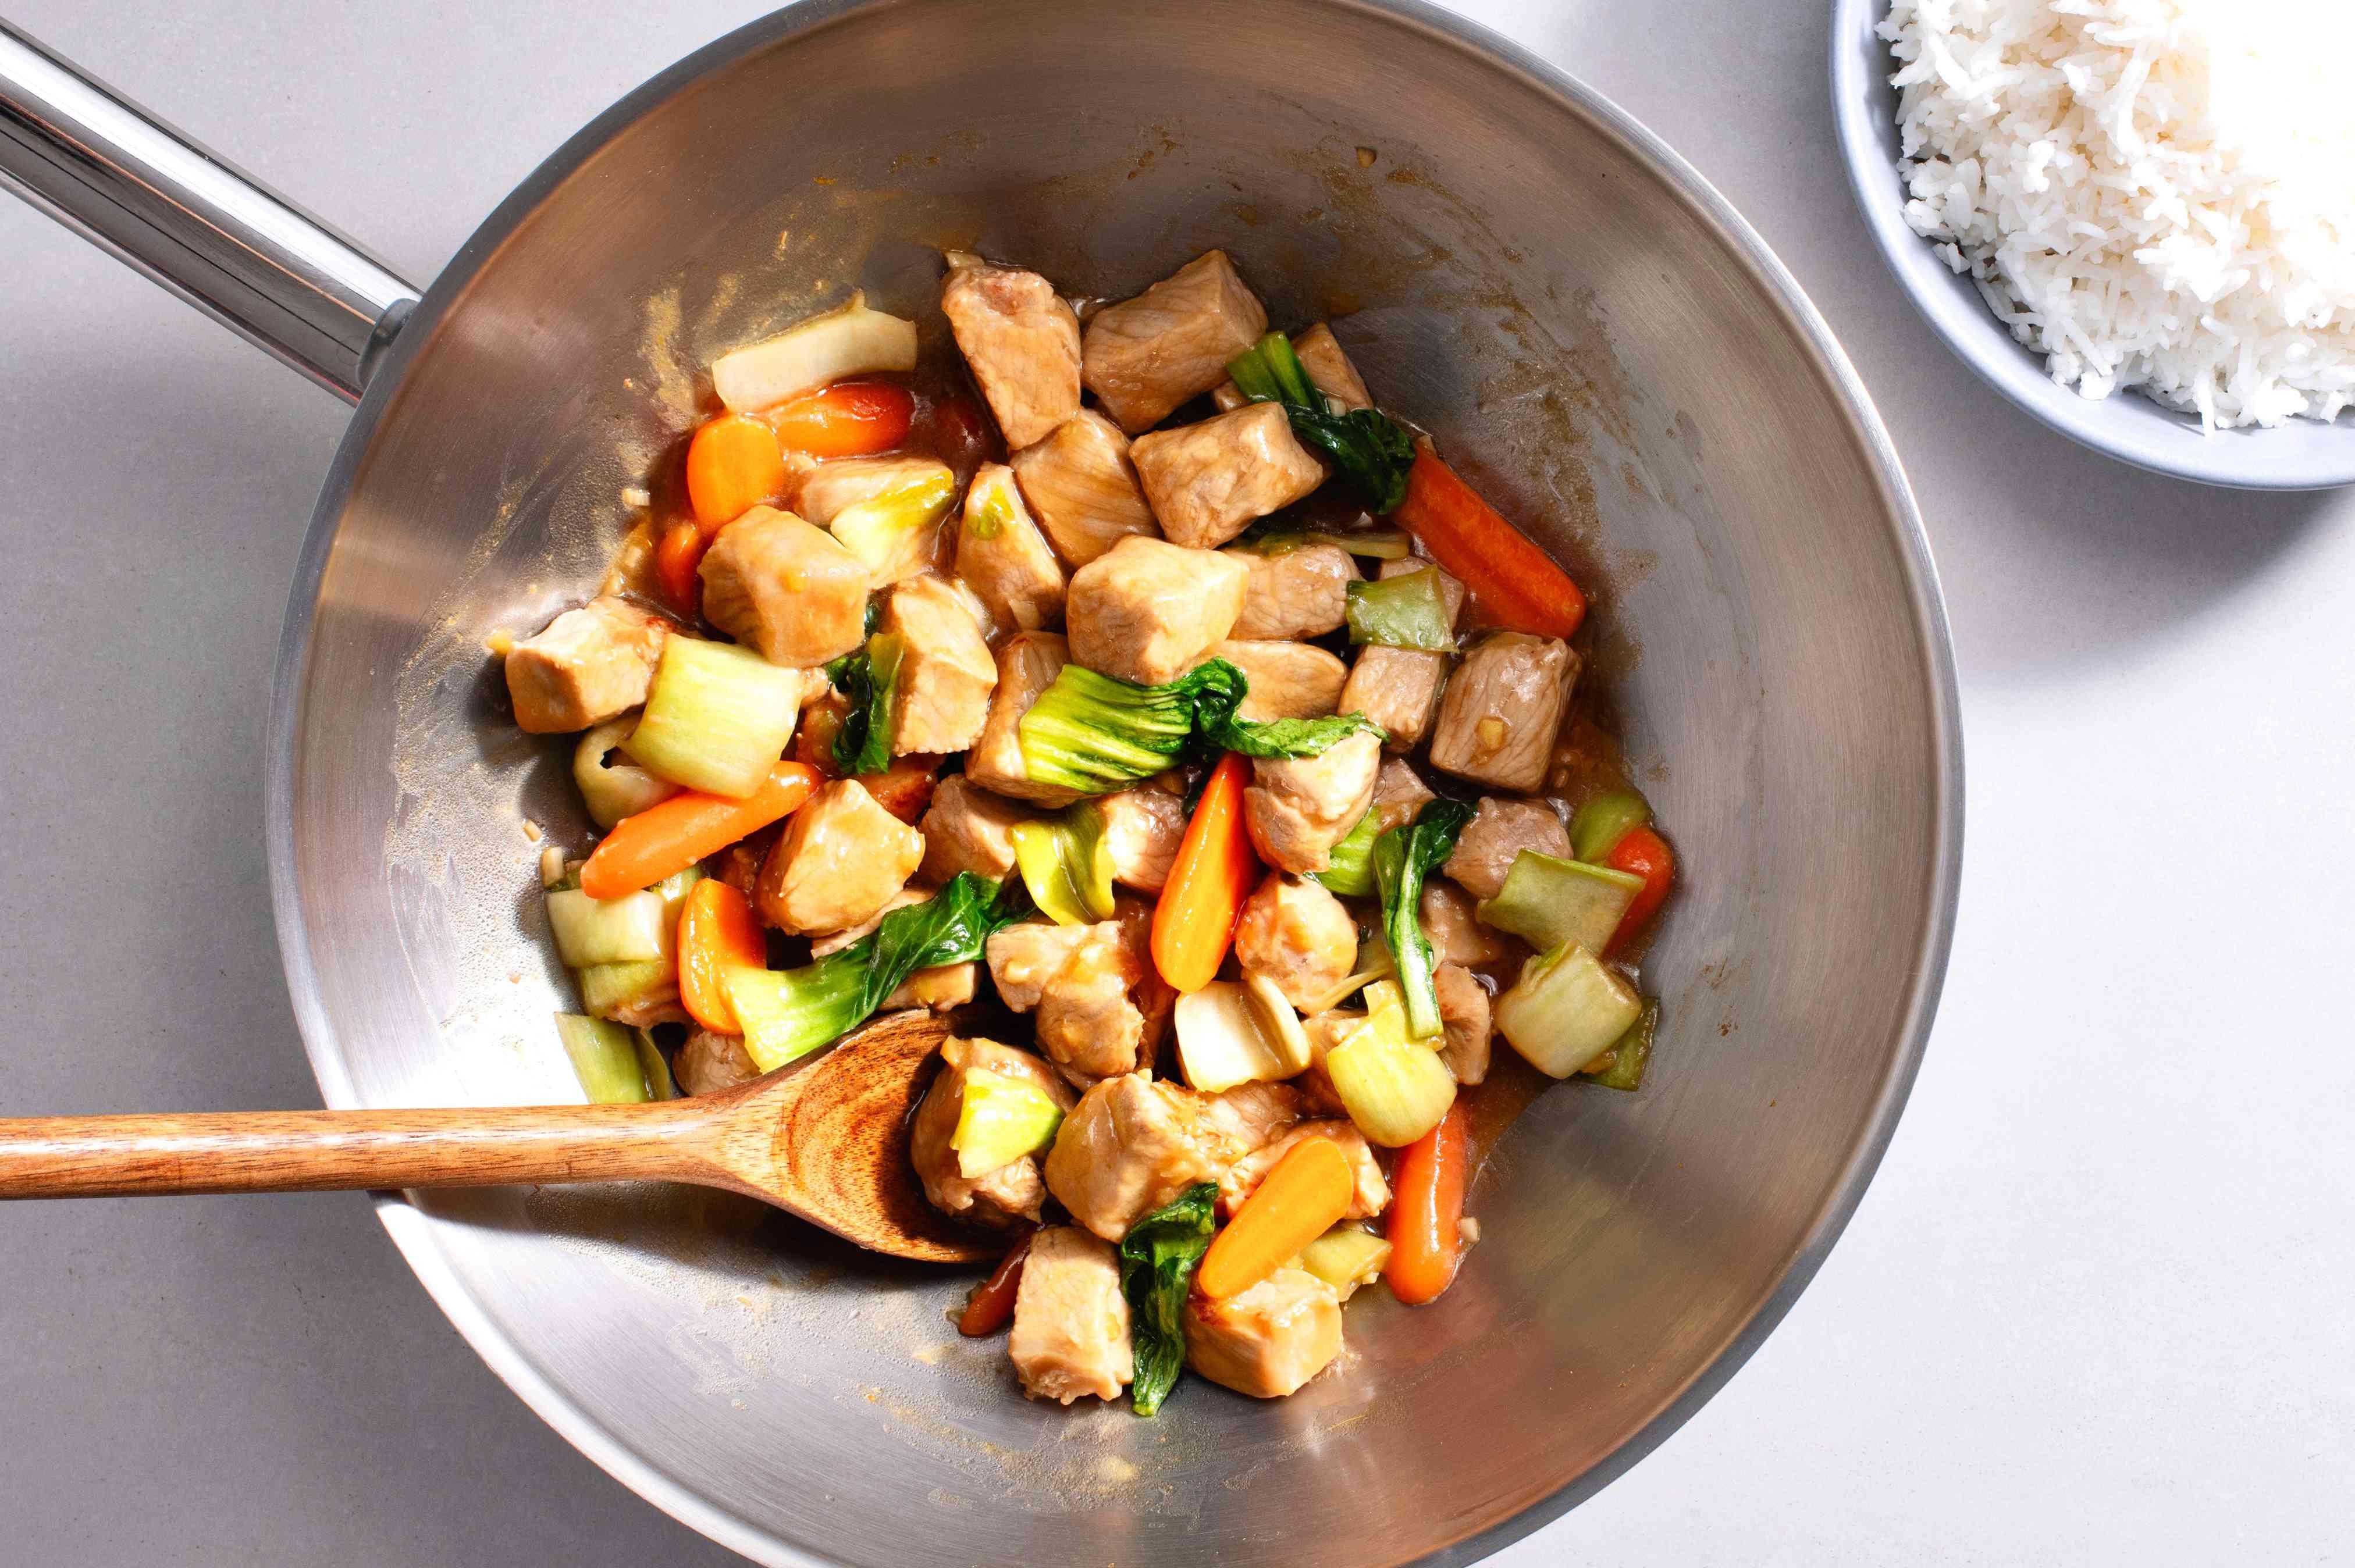 Chinese Orange Pork Chop Stir-fry in a wok